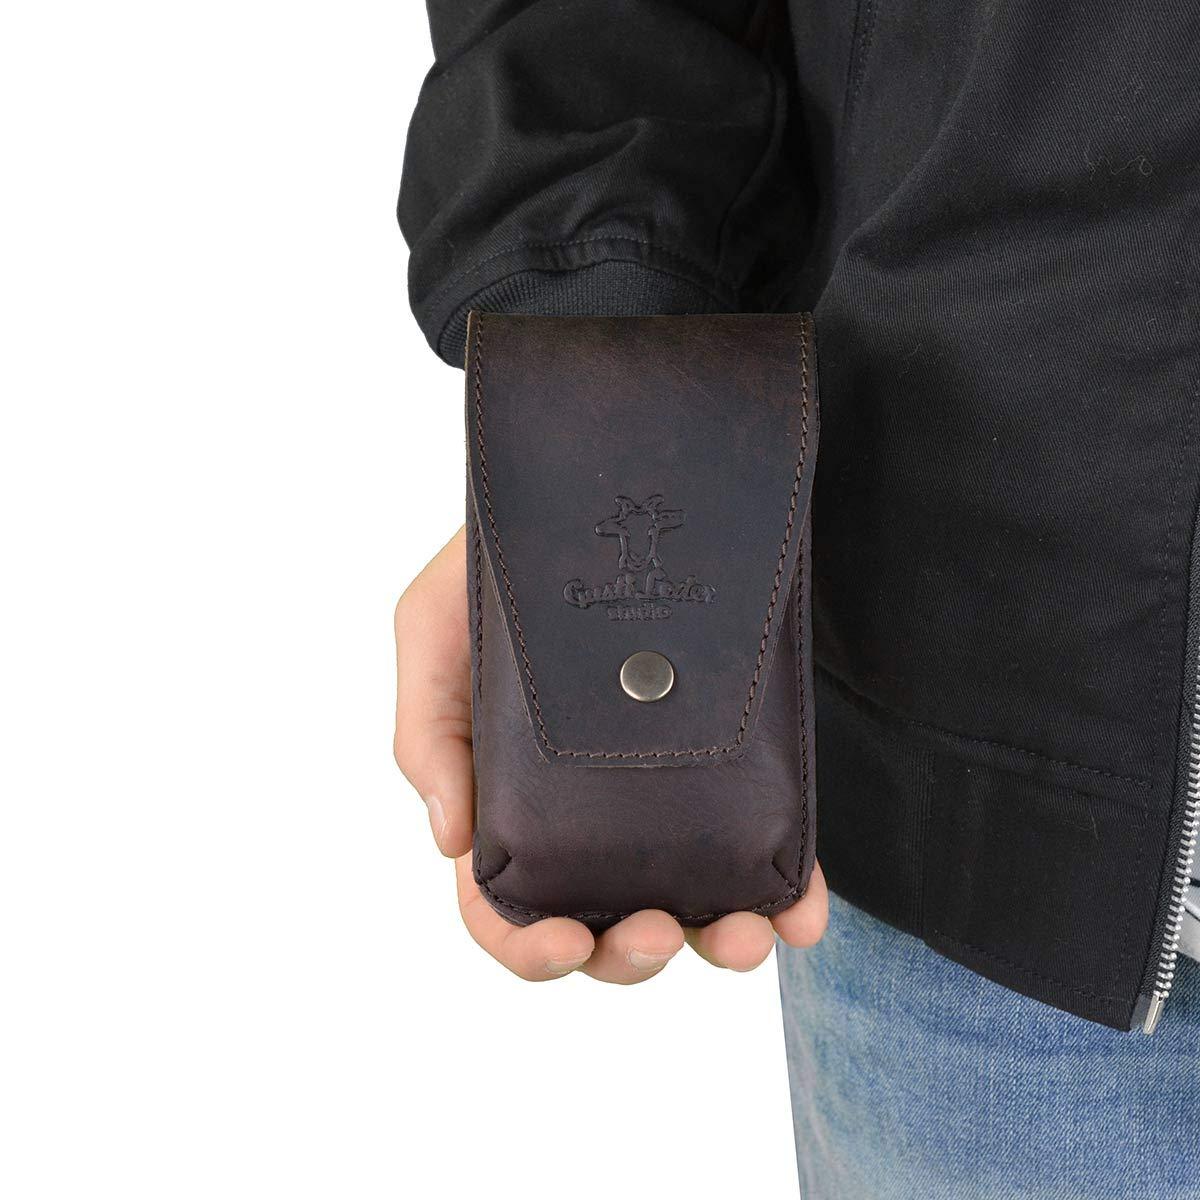 Gusti Pelle Tasca Portapenne Astuccio Portamatite Organizer 2S12